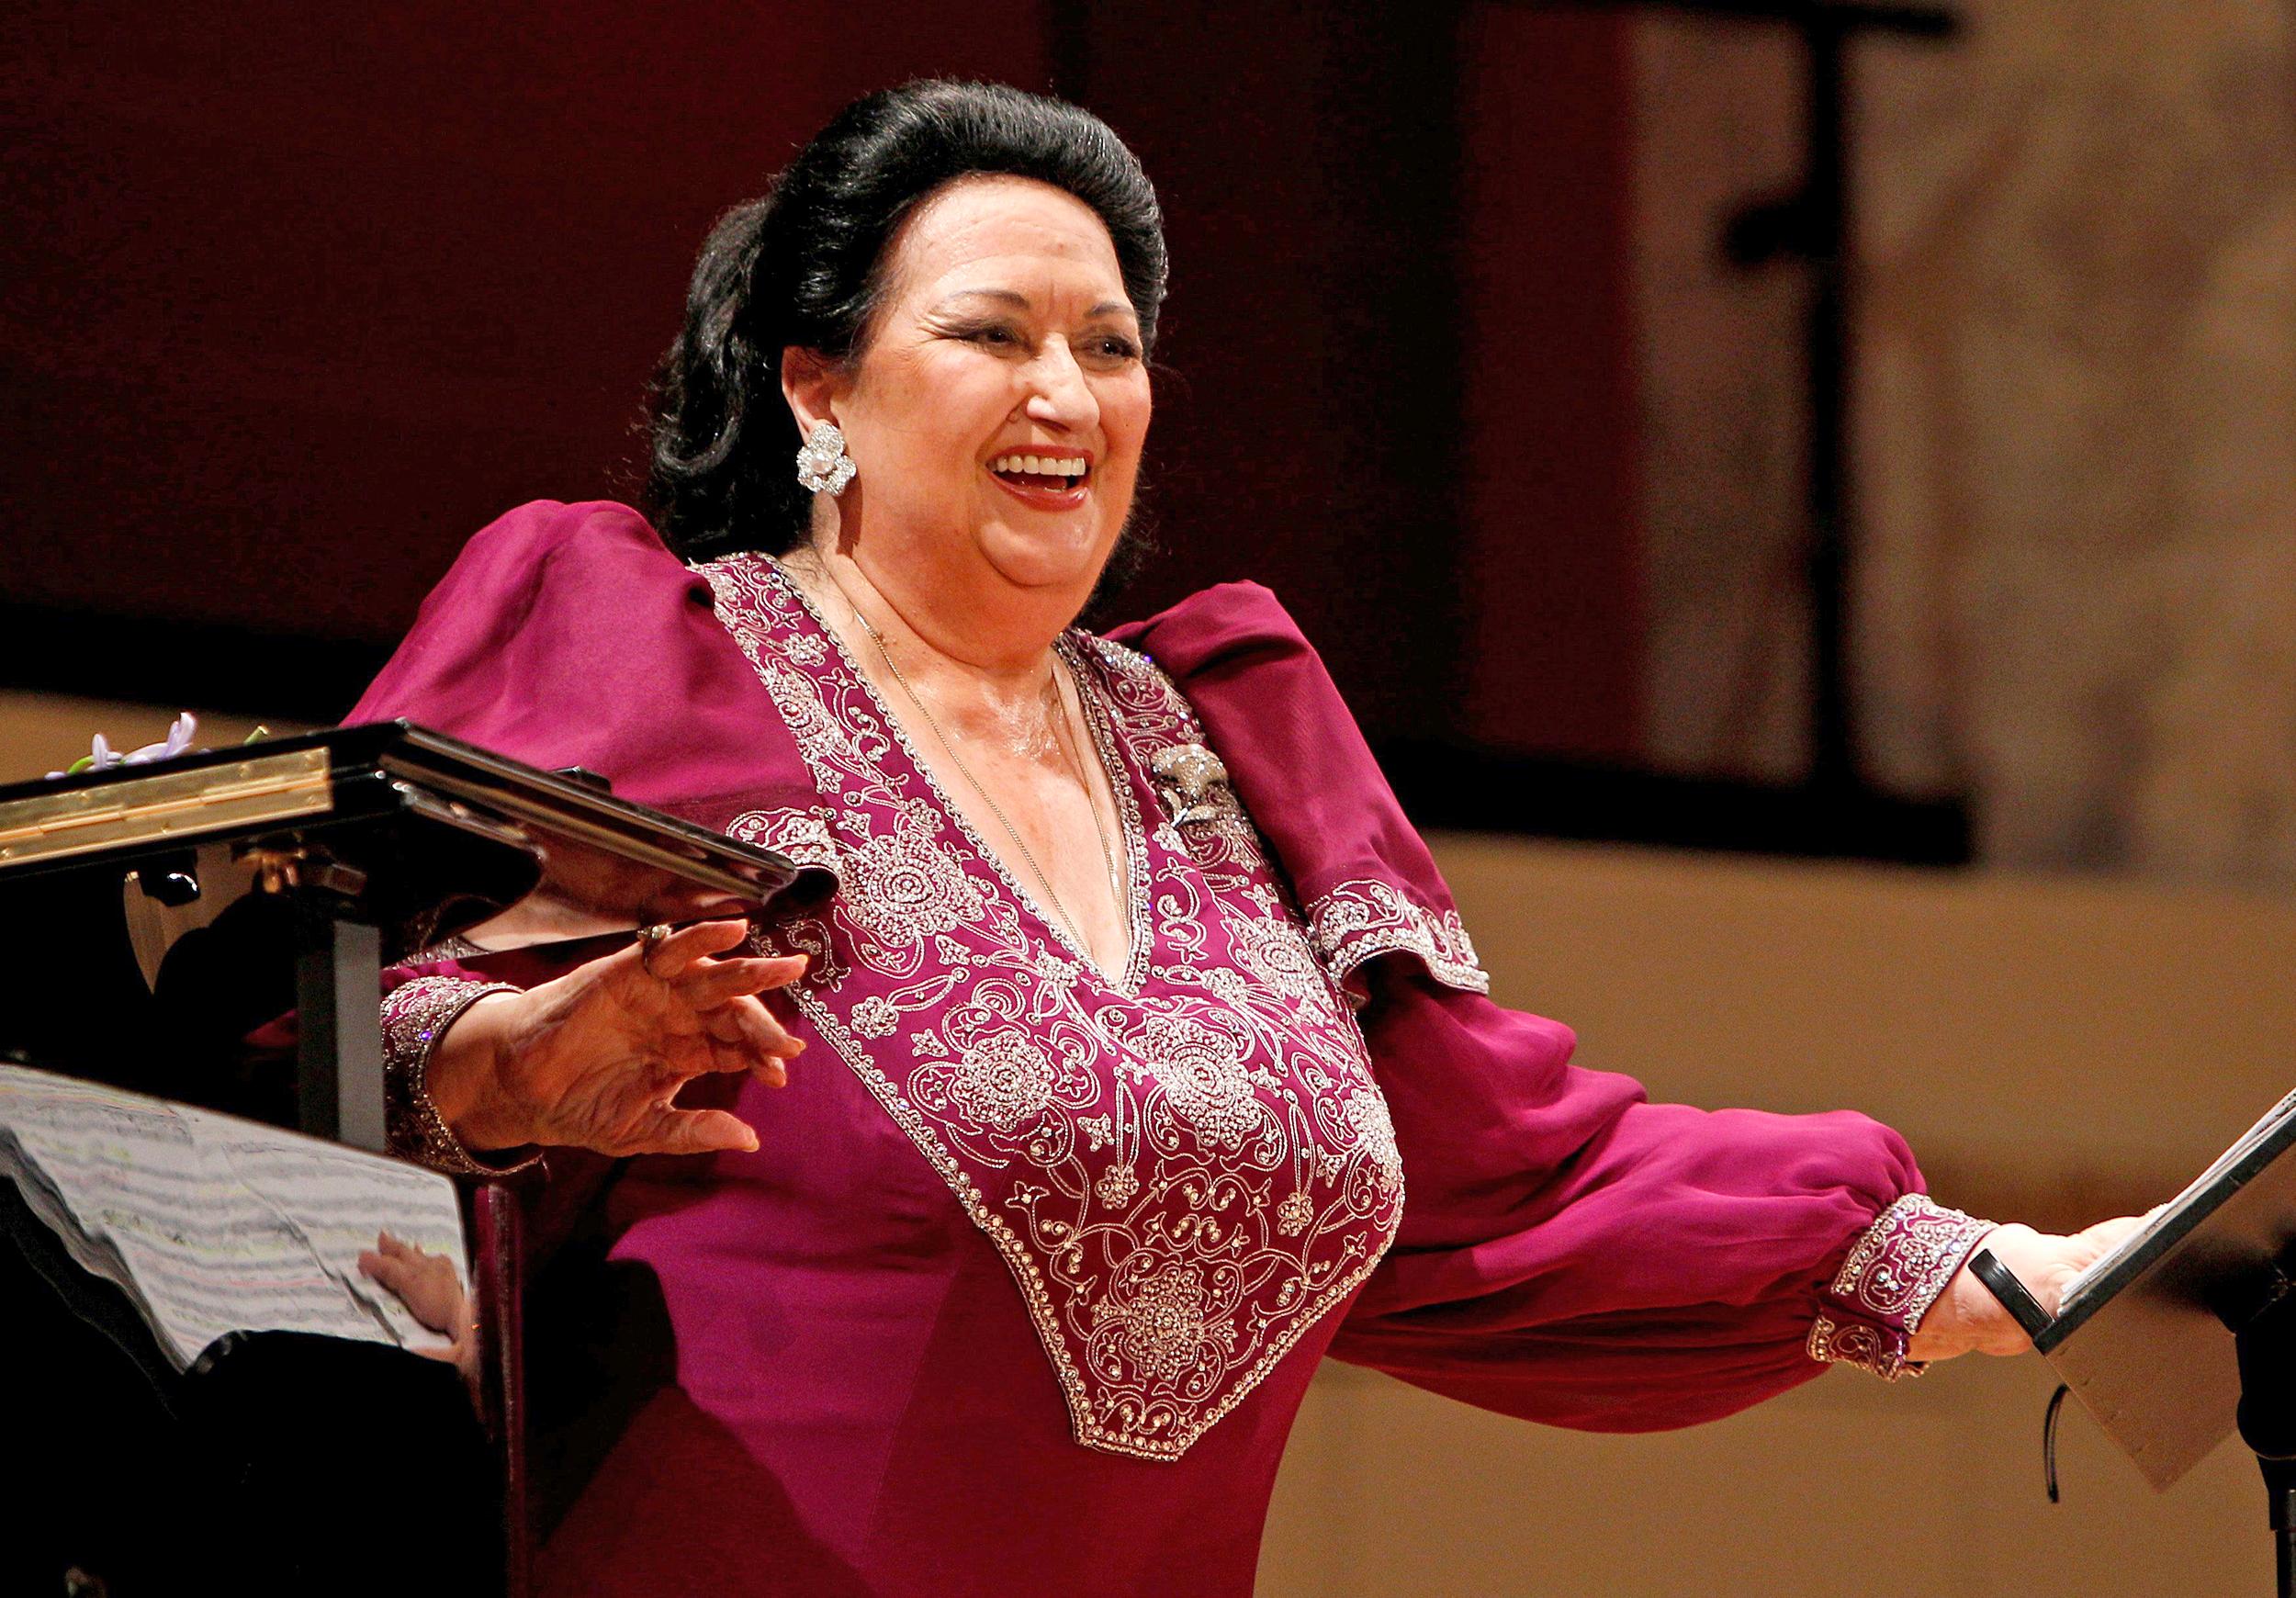 Morre a soprano espanhola Montserrat Caballé, aos 85 anos – Badalo